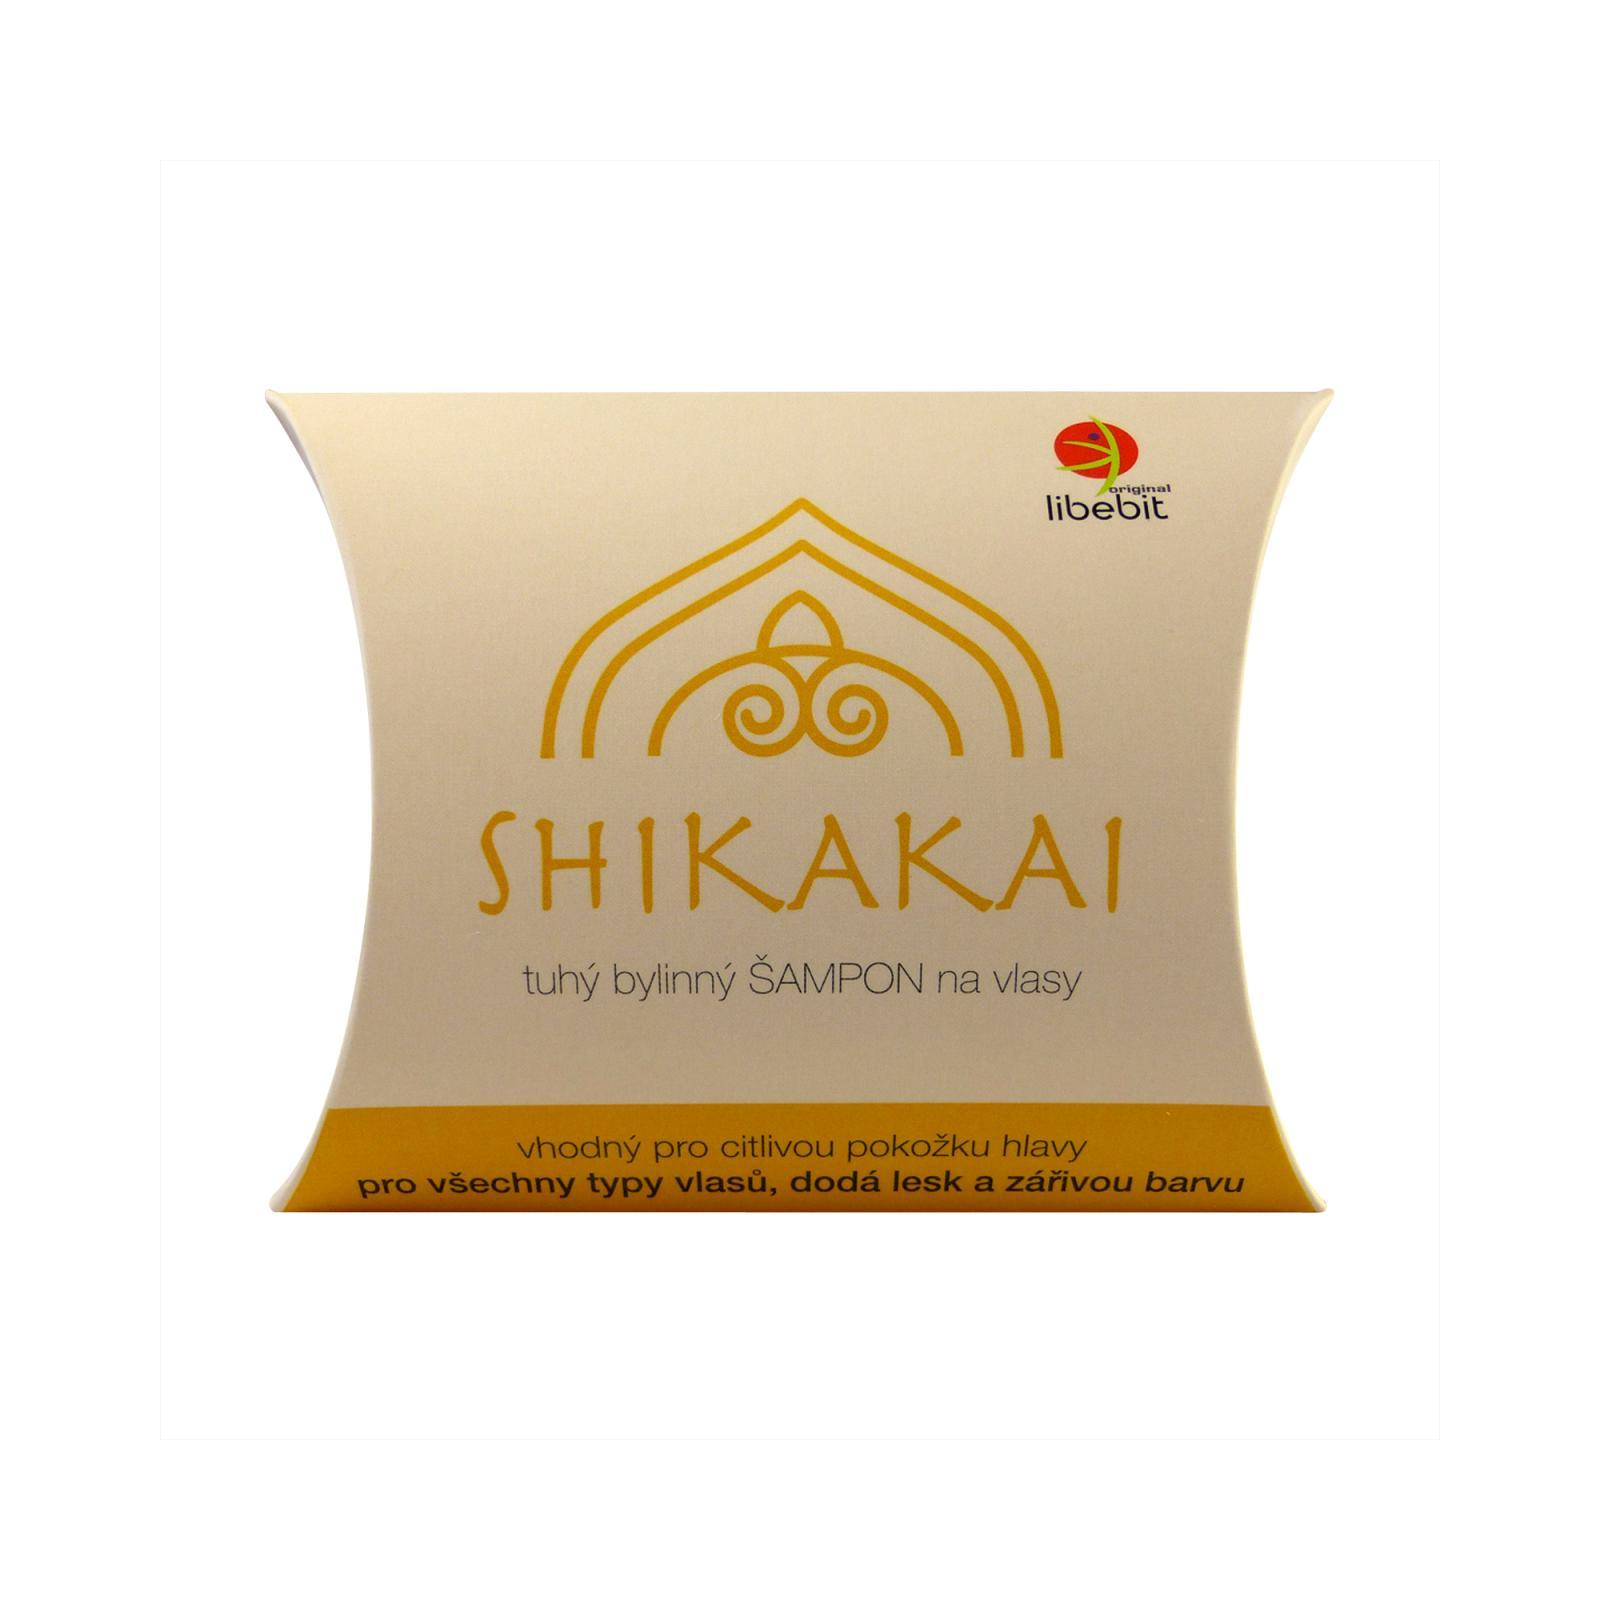 Libebit Tuhý bylinný šampon SHIKAKAI 70 g